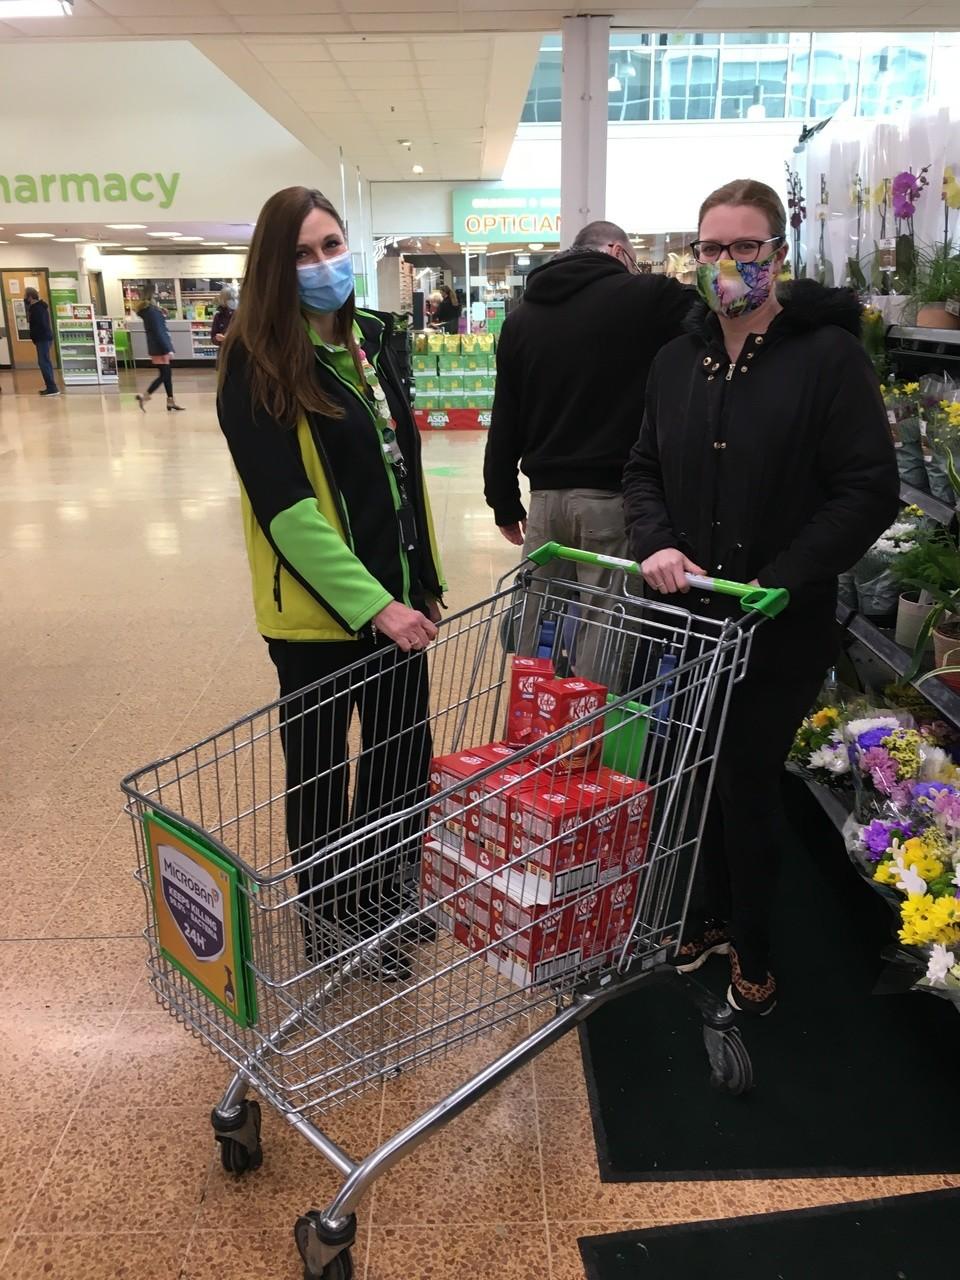 Easter egg donations for Cossham Gardens Leonard Cheshire care home . | Asda Longwell Green